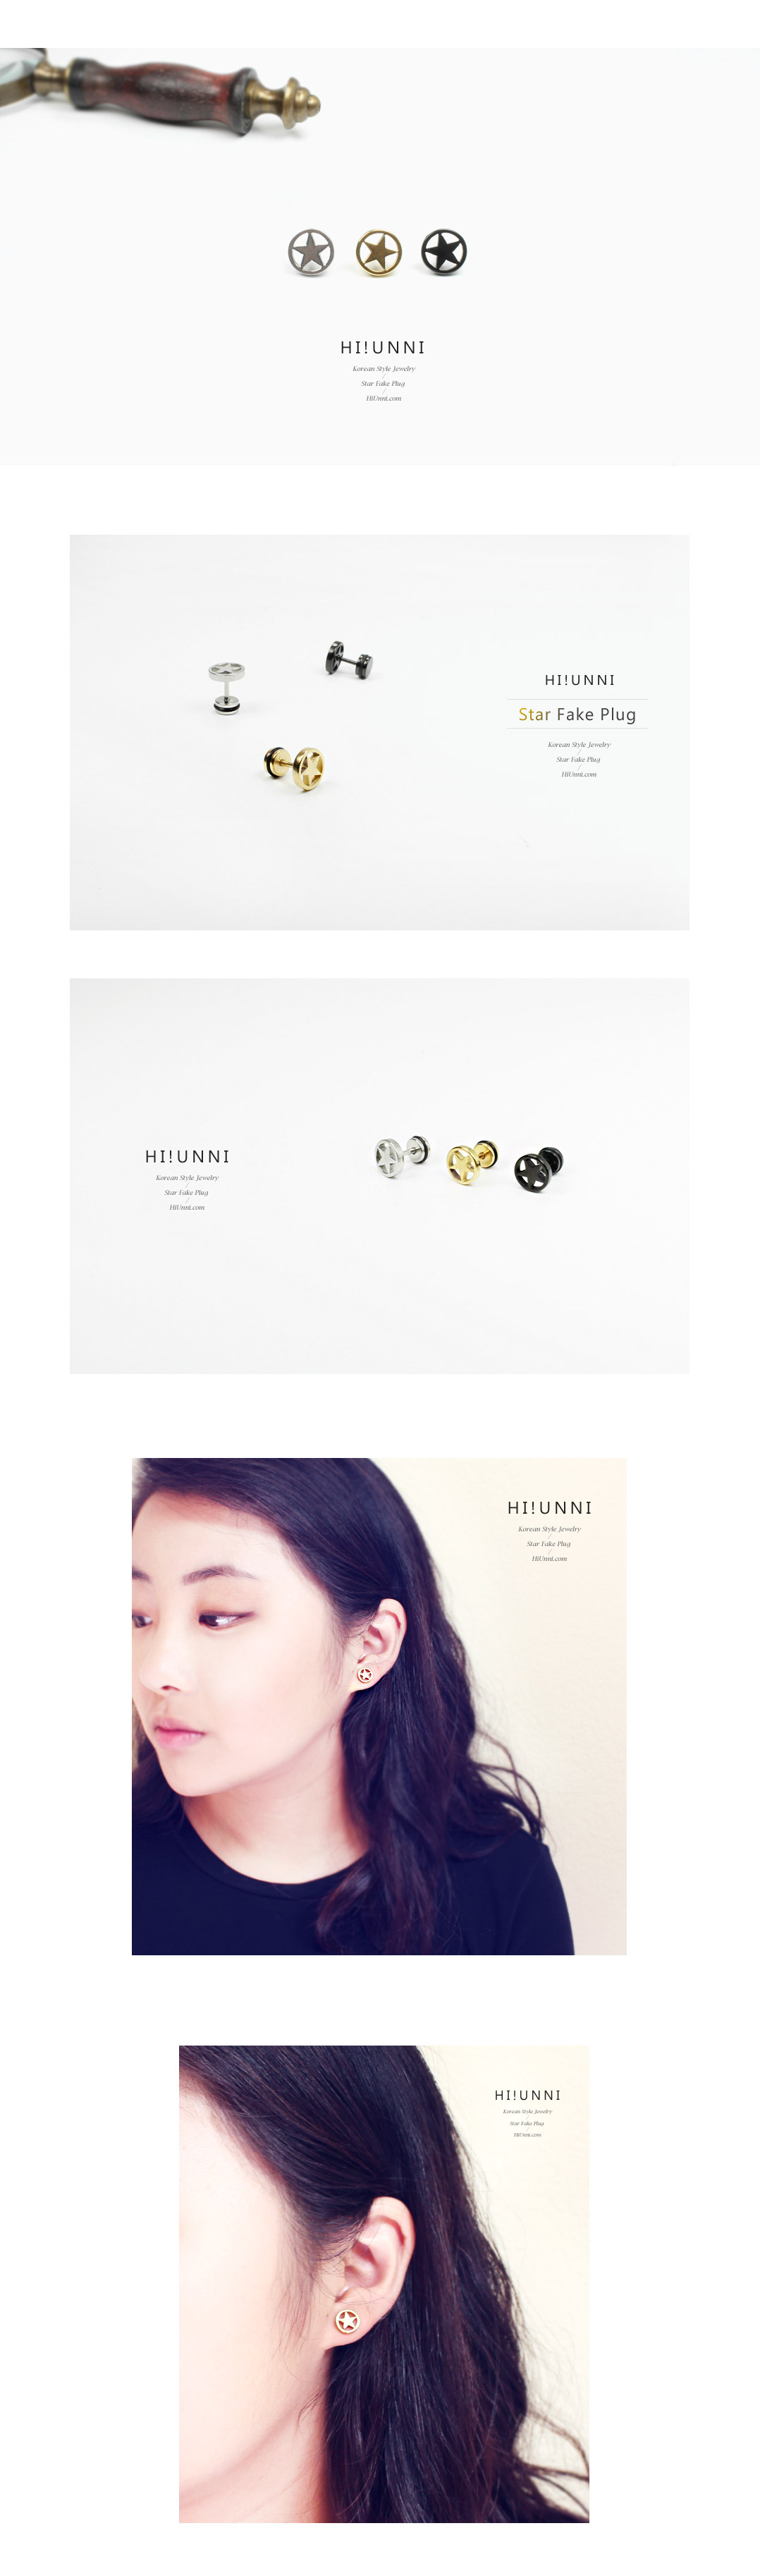 accessories_Korean-style_asian-style_316l_ear_cartilage_piercing_earrings_16g_ear-studs_cheater_fake_plug_star_4